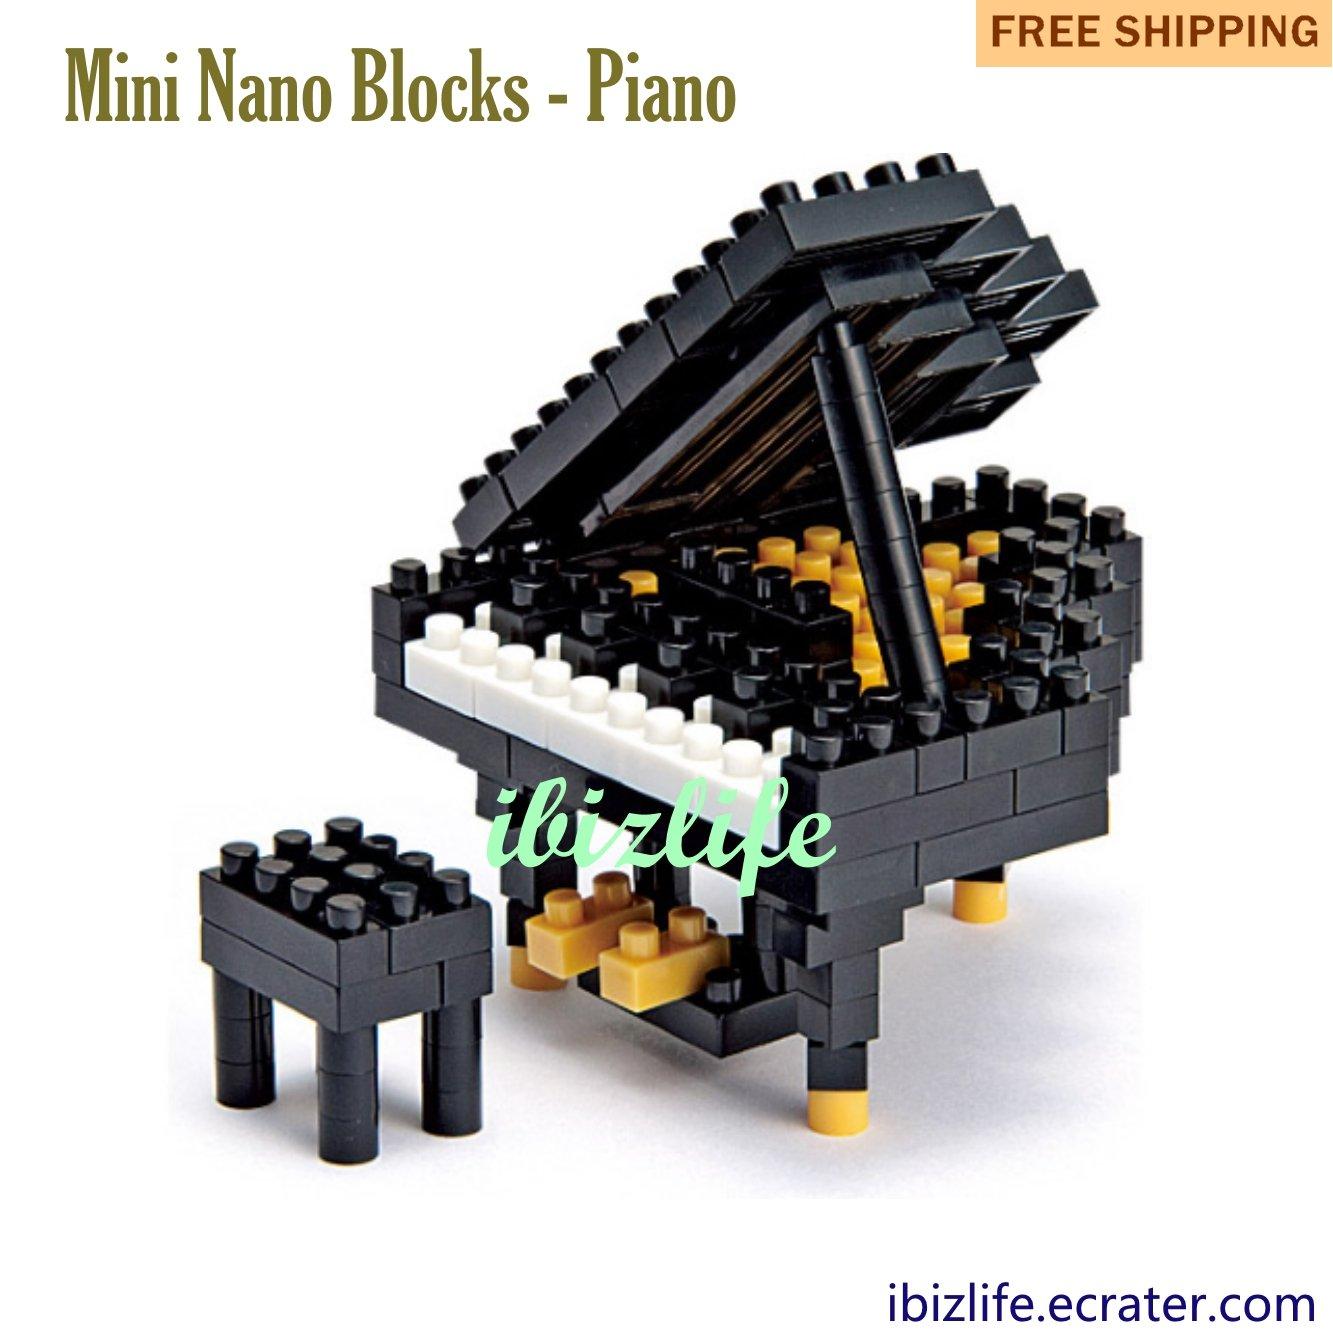 Piano: Diamond Blocks Mini Bricks Building Blocks DIY Education gifts - 110 pcs(BB01)